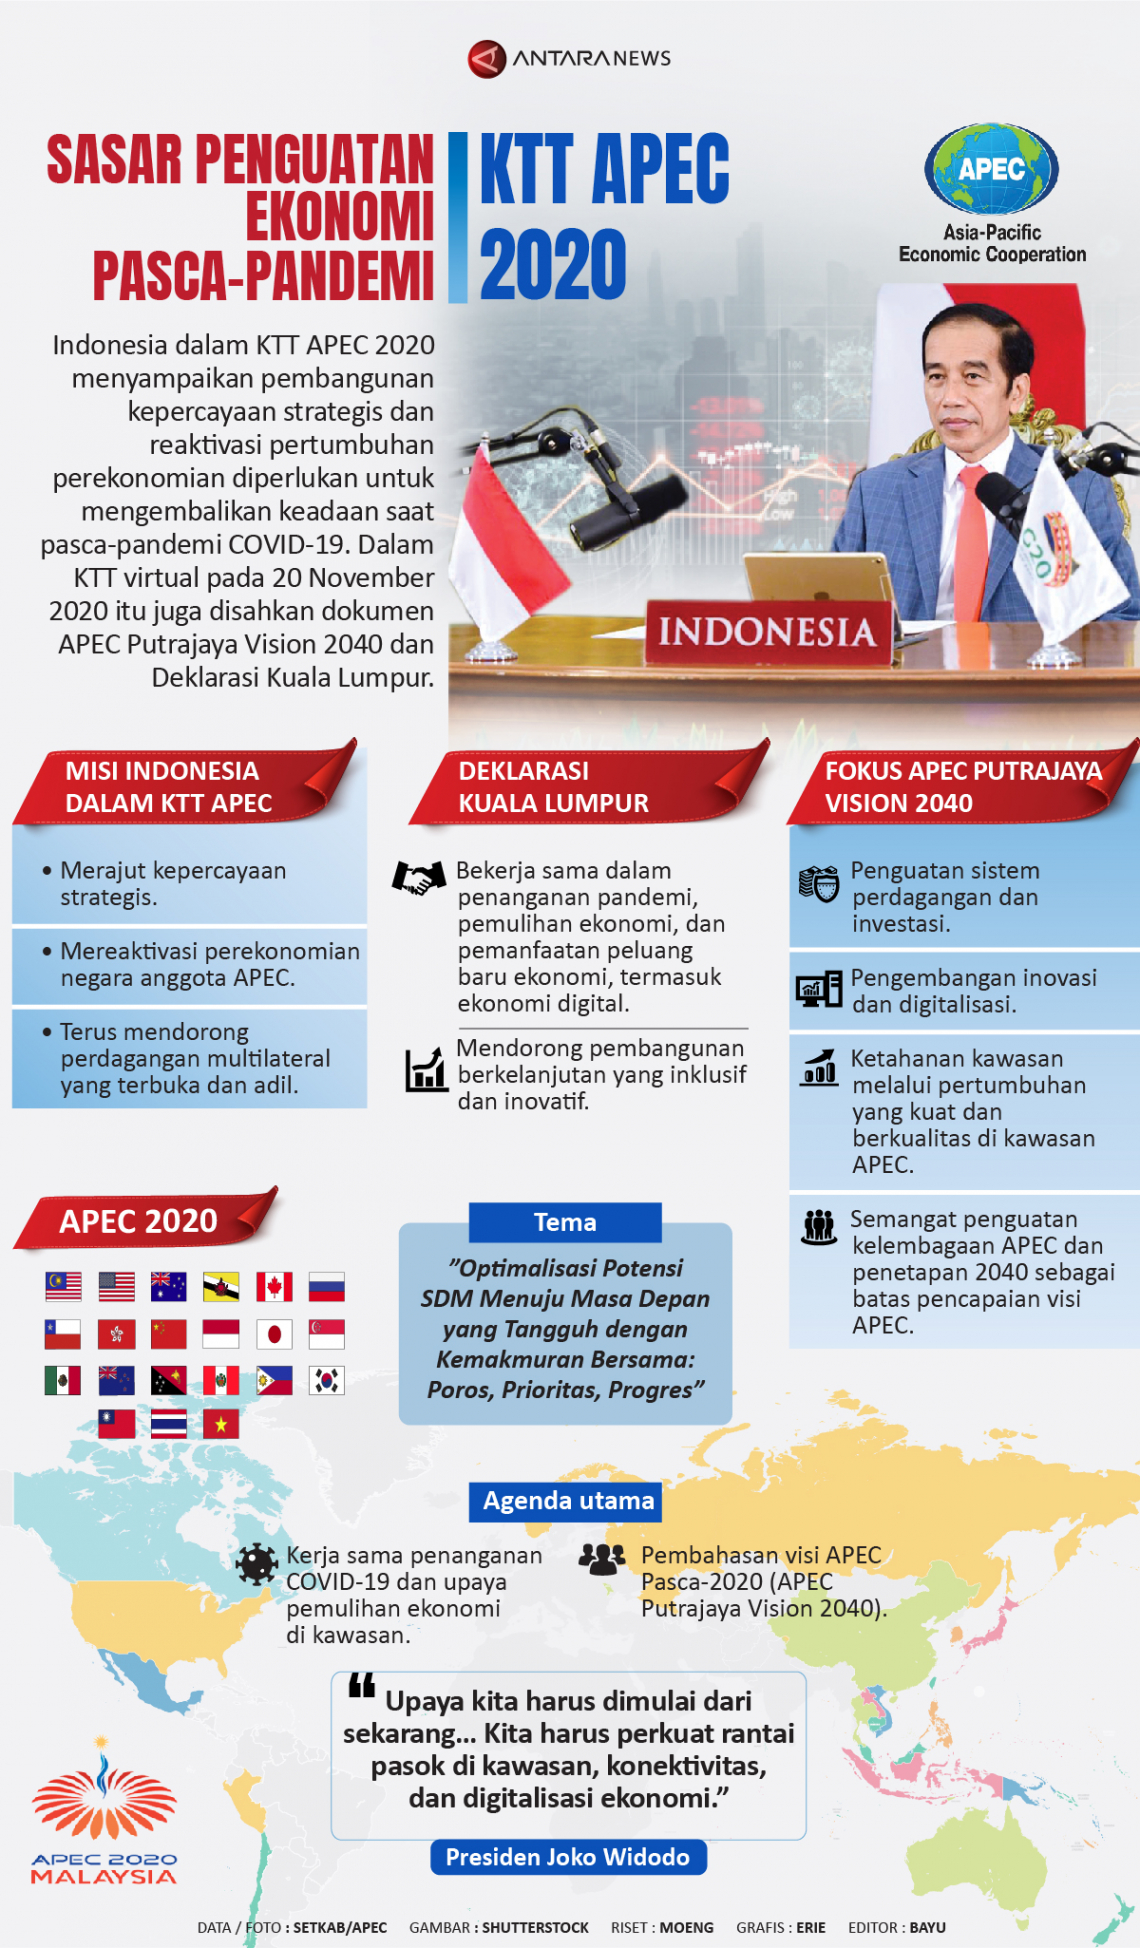 KTT APEC 2020 sasar penguatan ekonomi pasca-pandemi